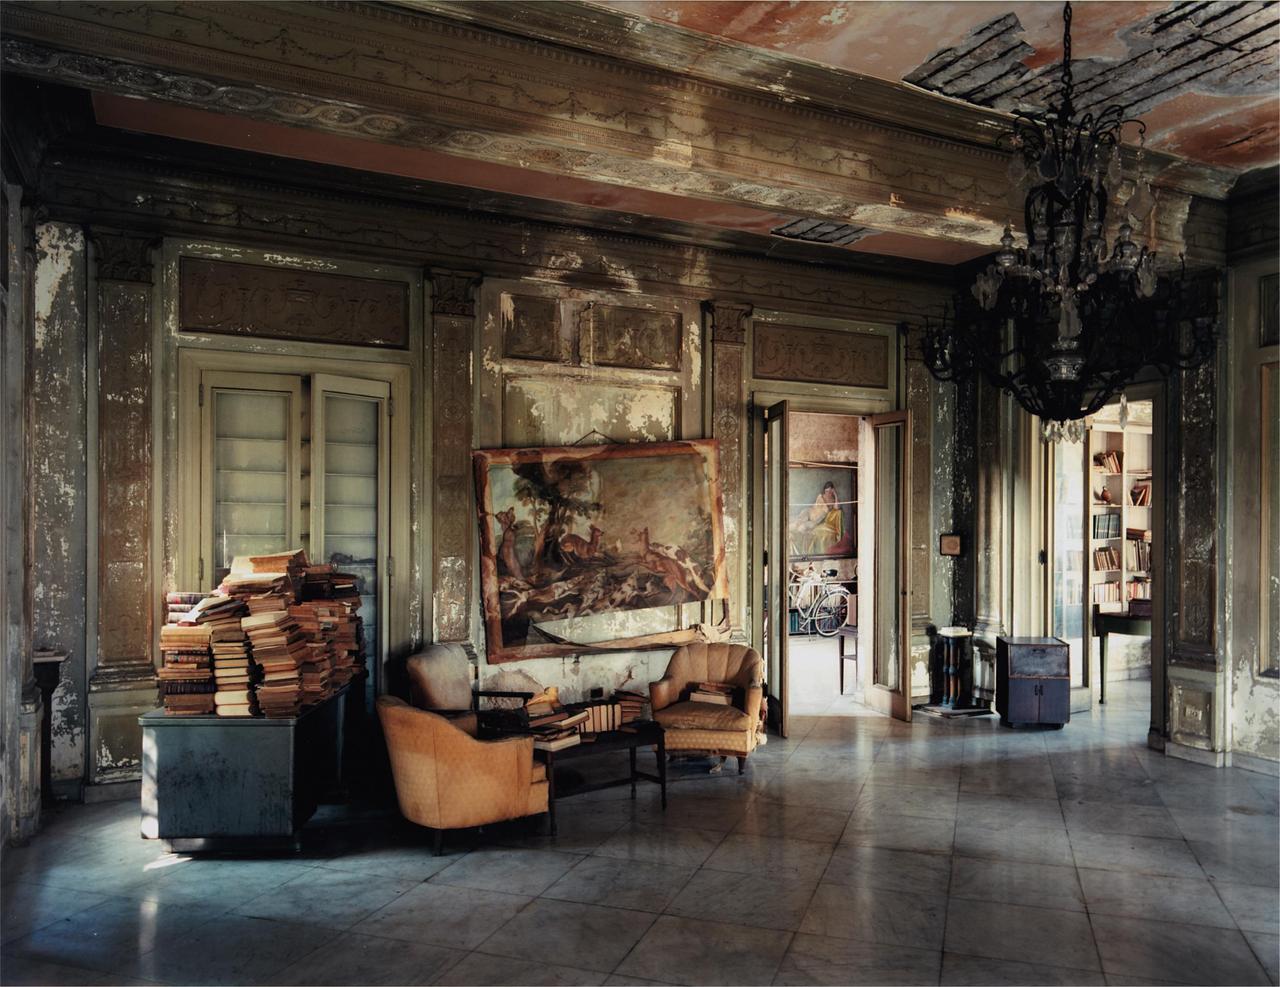 Photograph by Robert Polidori